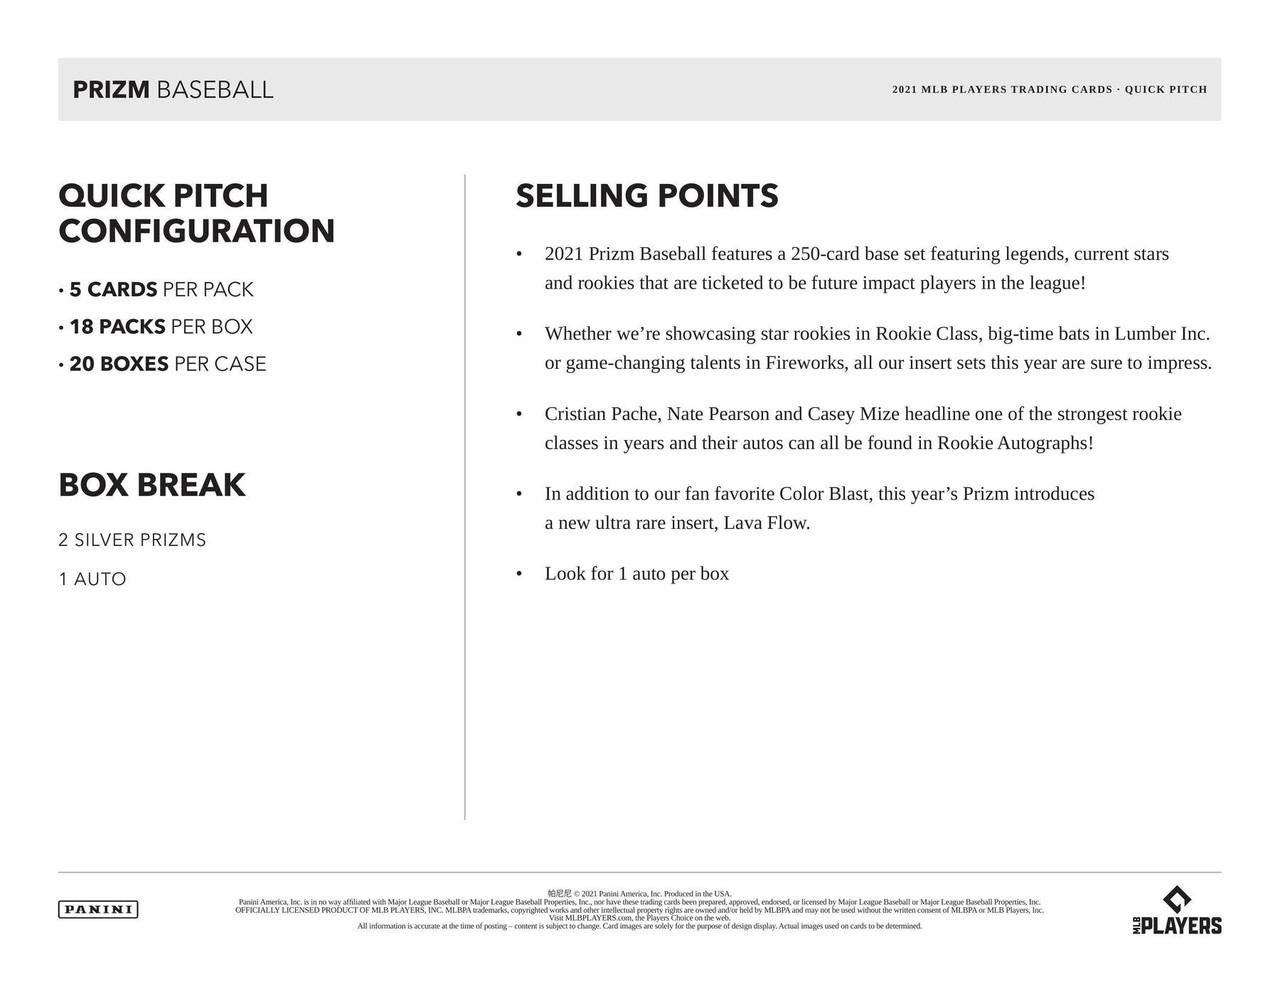 2021 Panini Prizm Quick Pitch Baseball Hobby Box